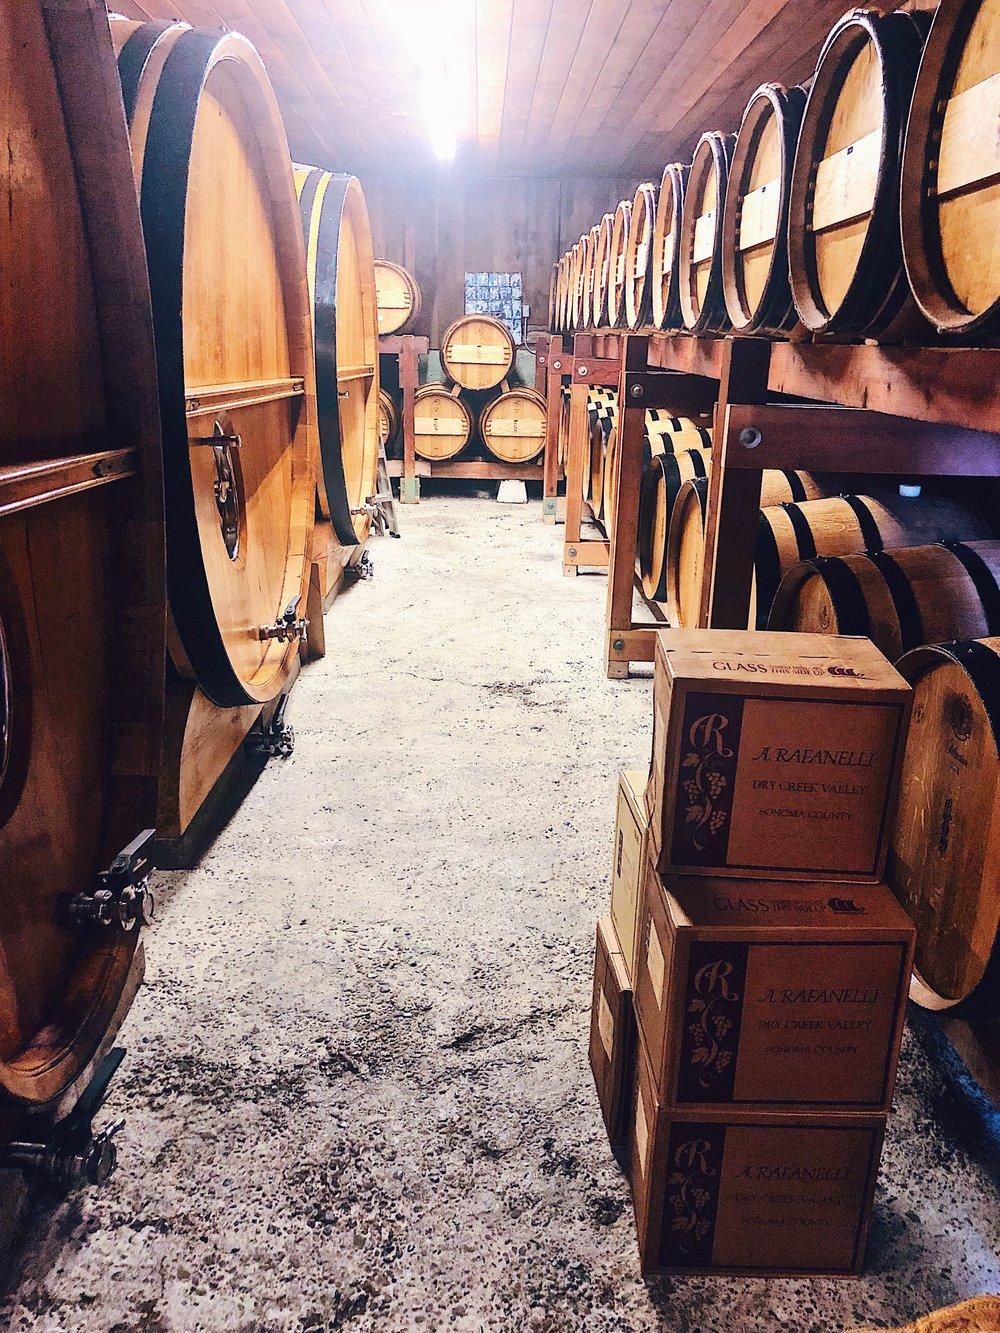 A. Rafanelli Winery Barrel Room